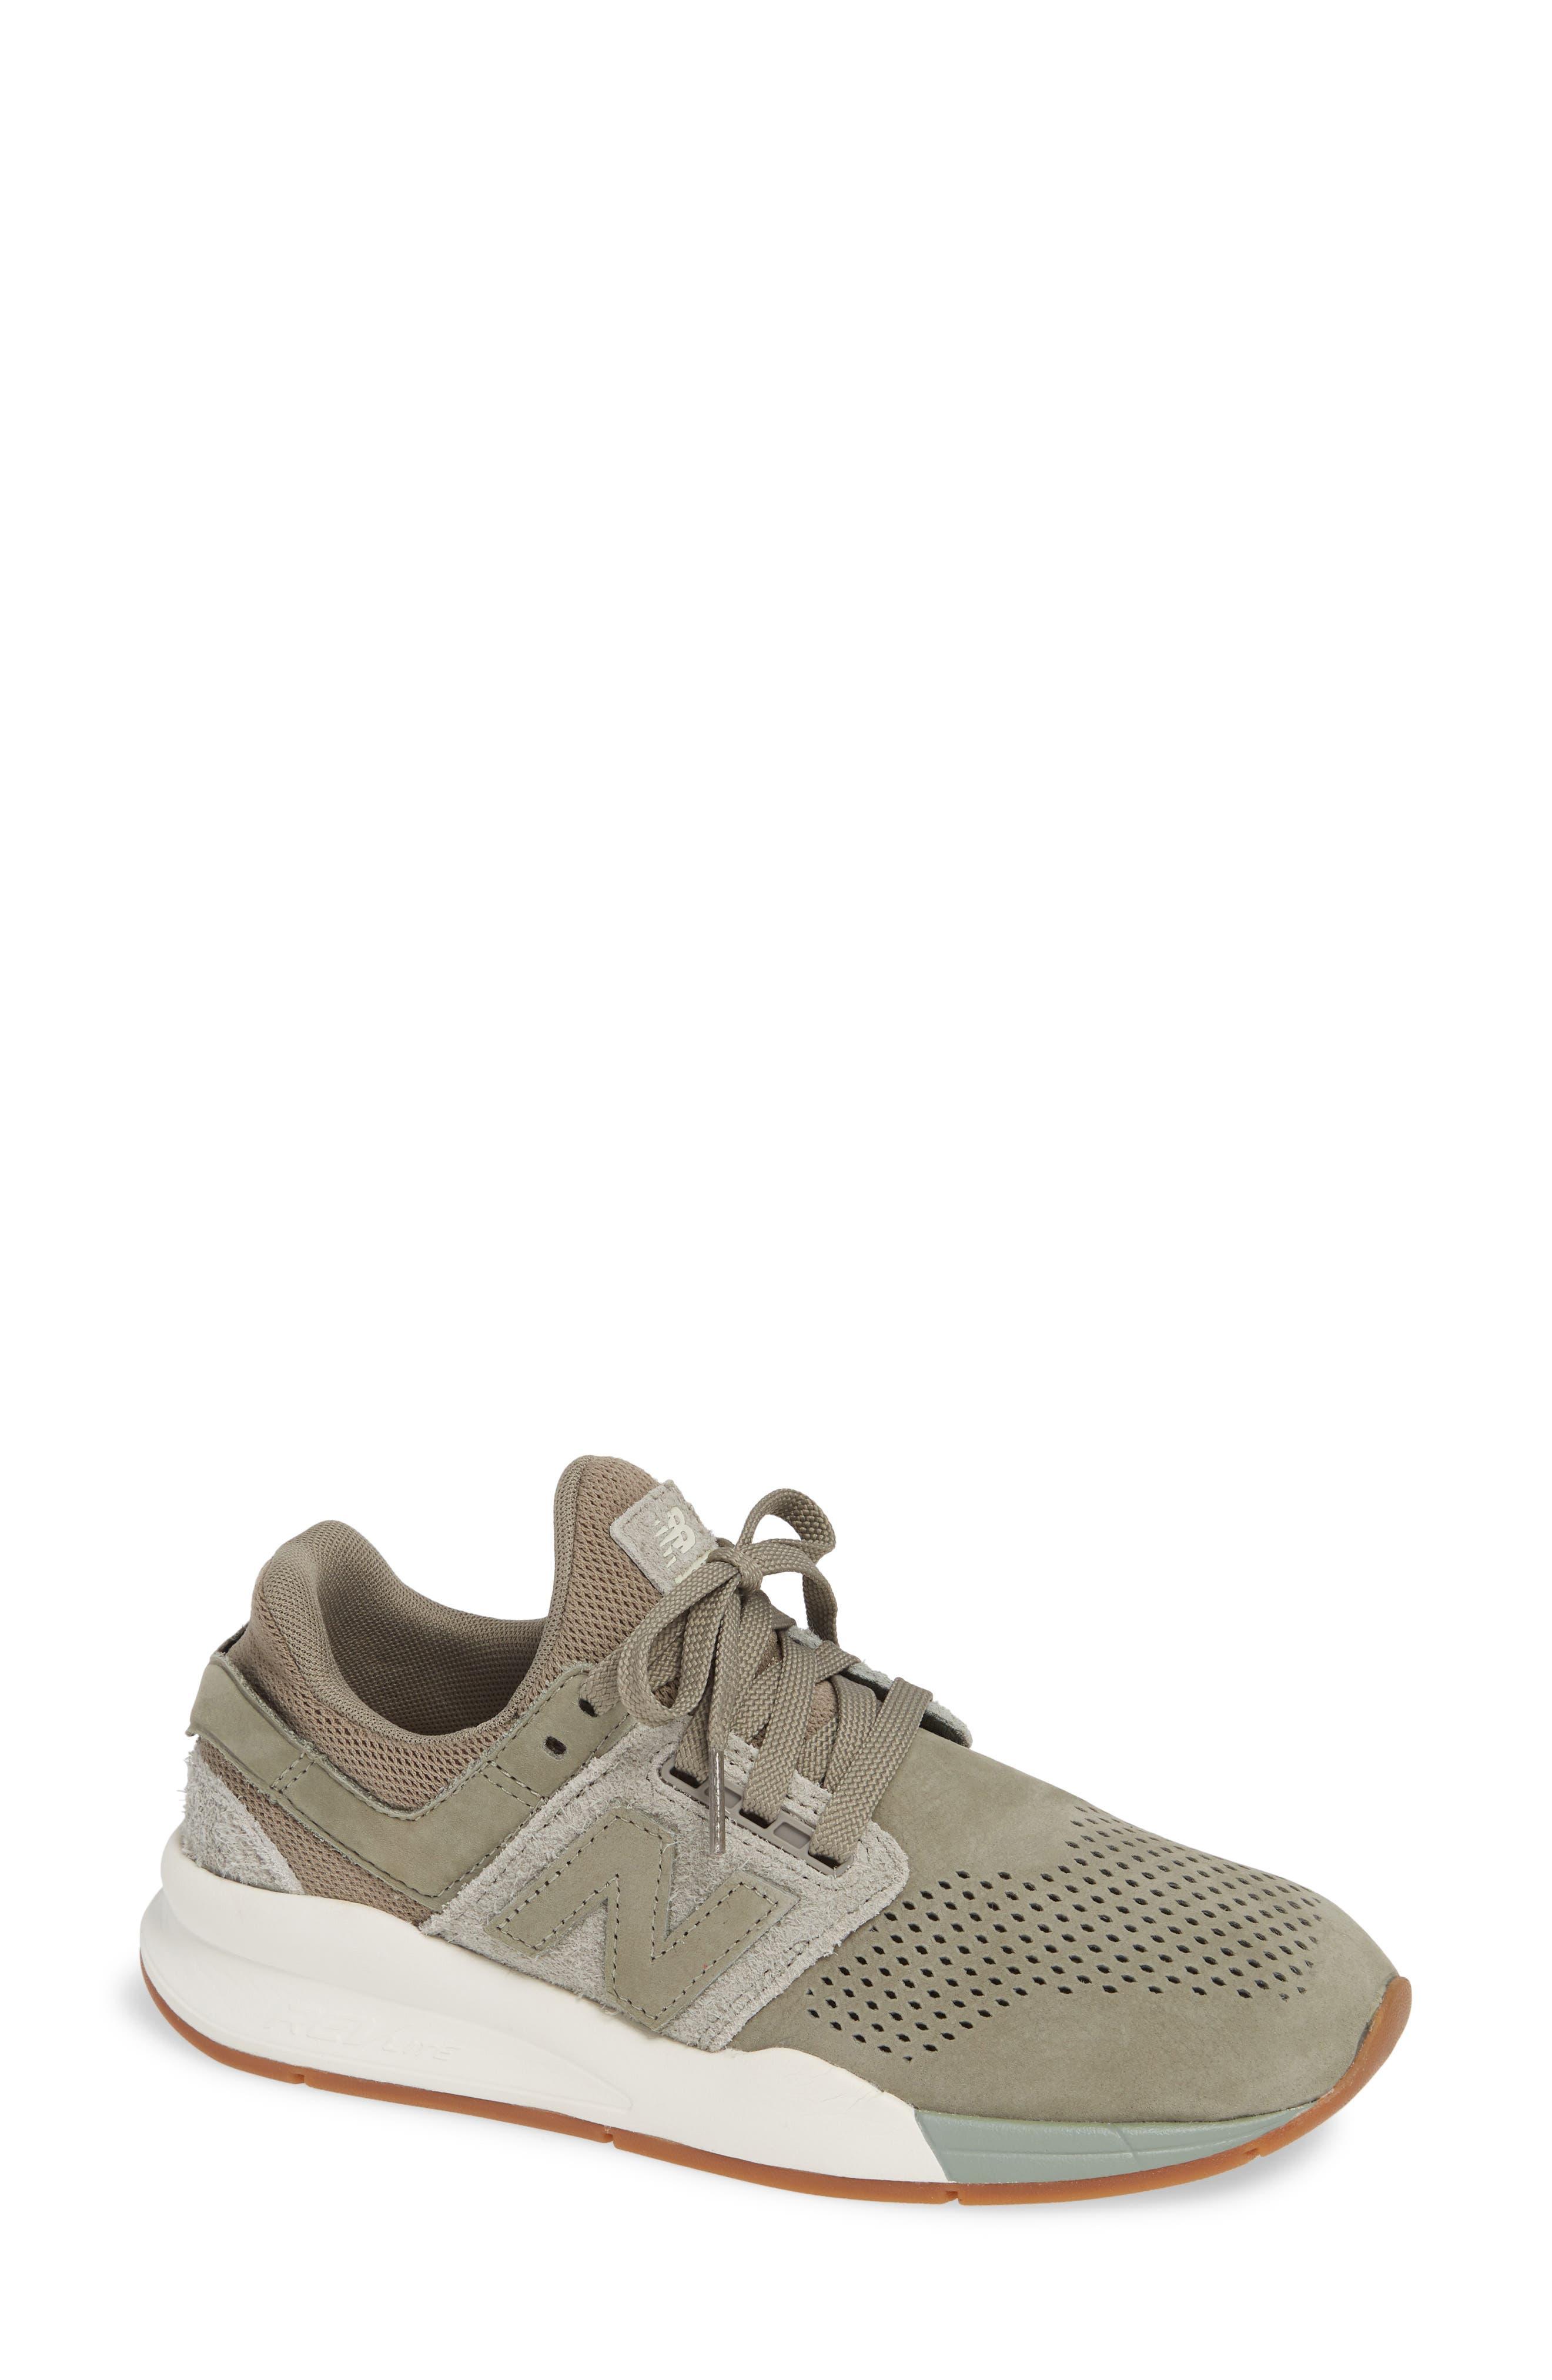 NEW BALANCE, Sport Style 247 Sneaker, Main thumbnail 1, color, MILITARY URBAN GREY